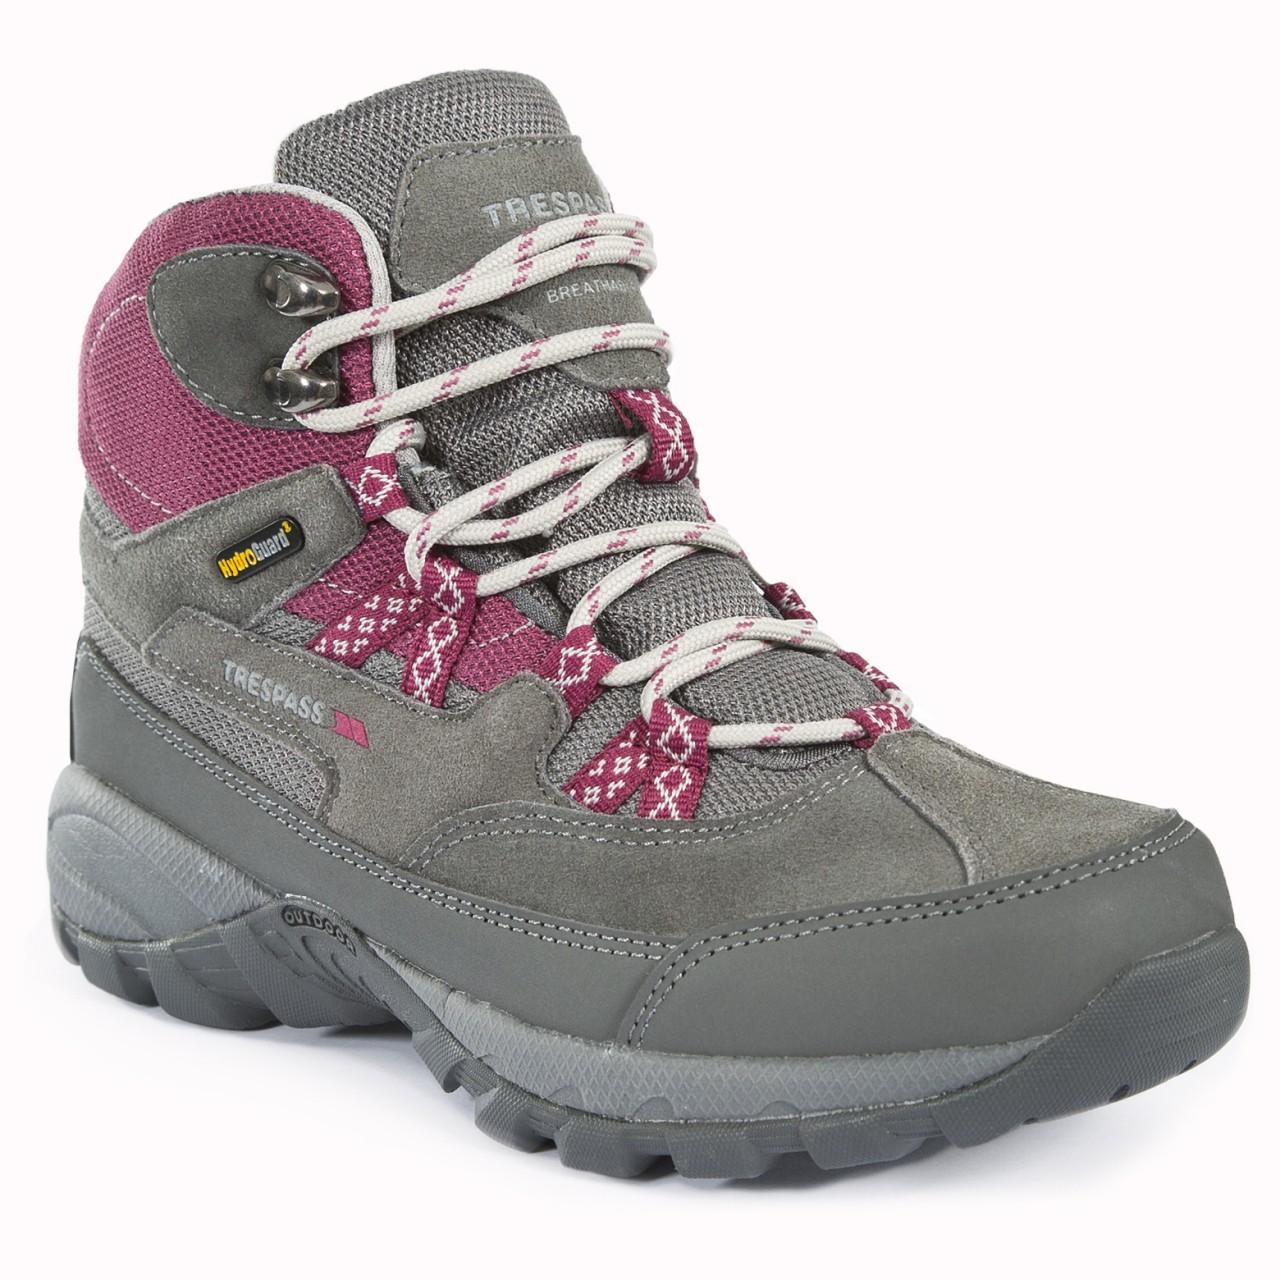 womens walking boots merse womenu0027s breathable walking boots xjxyupd